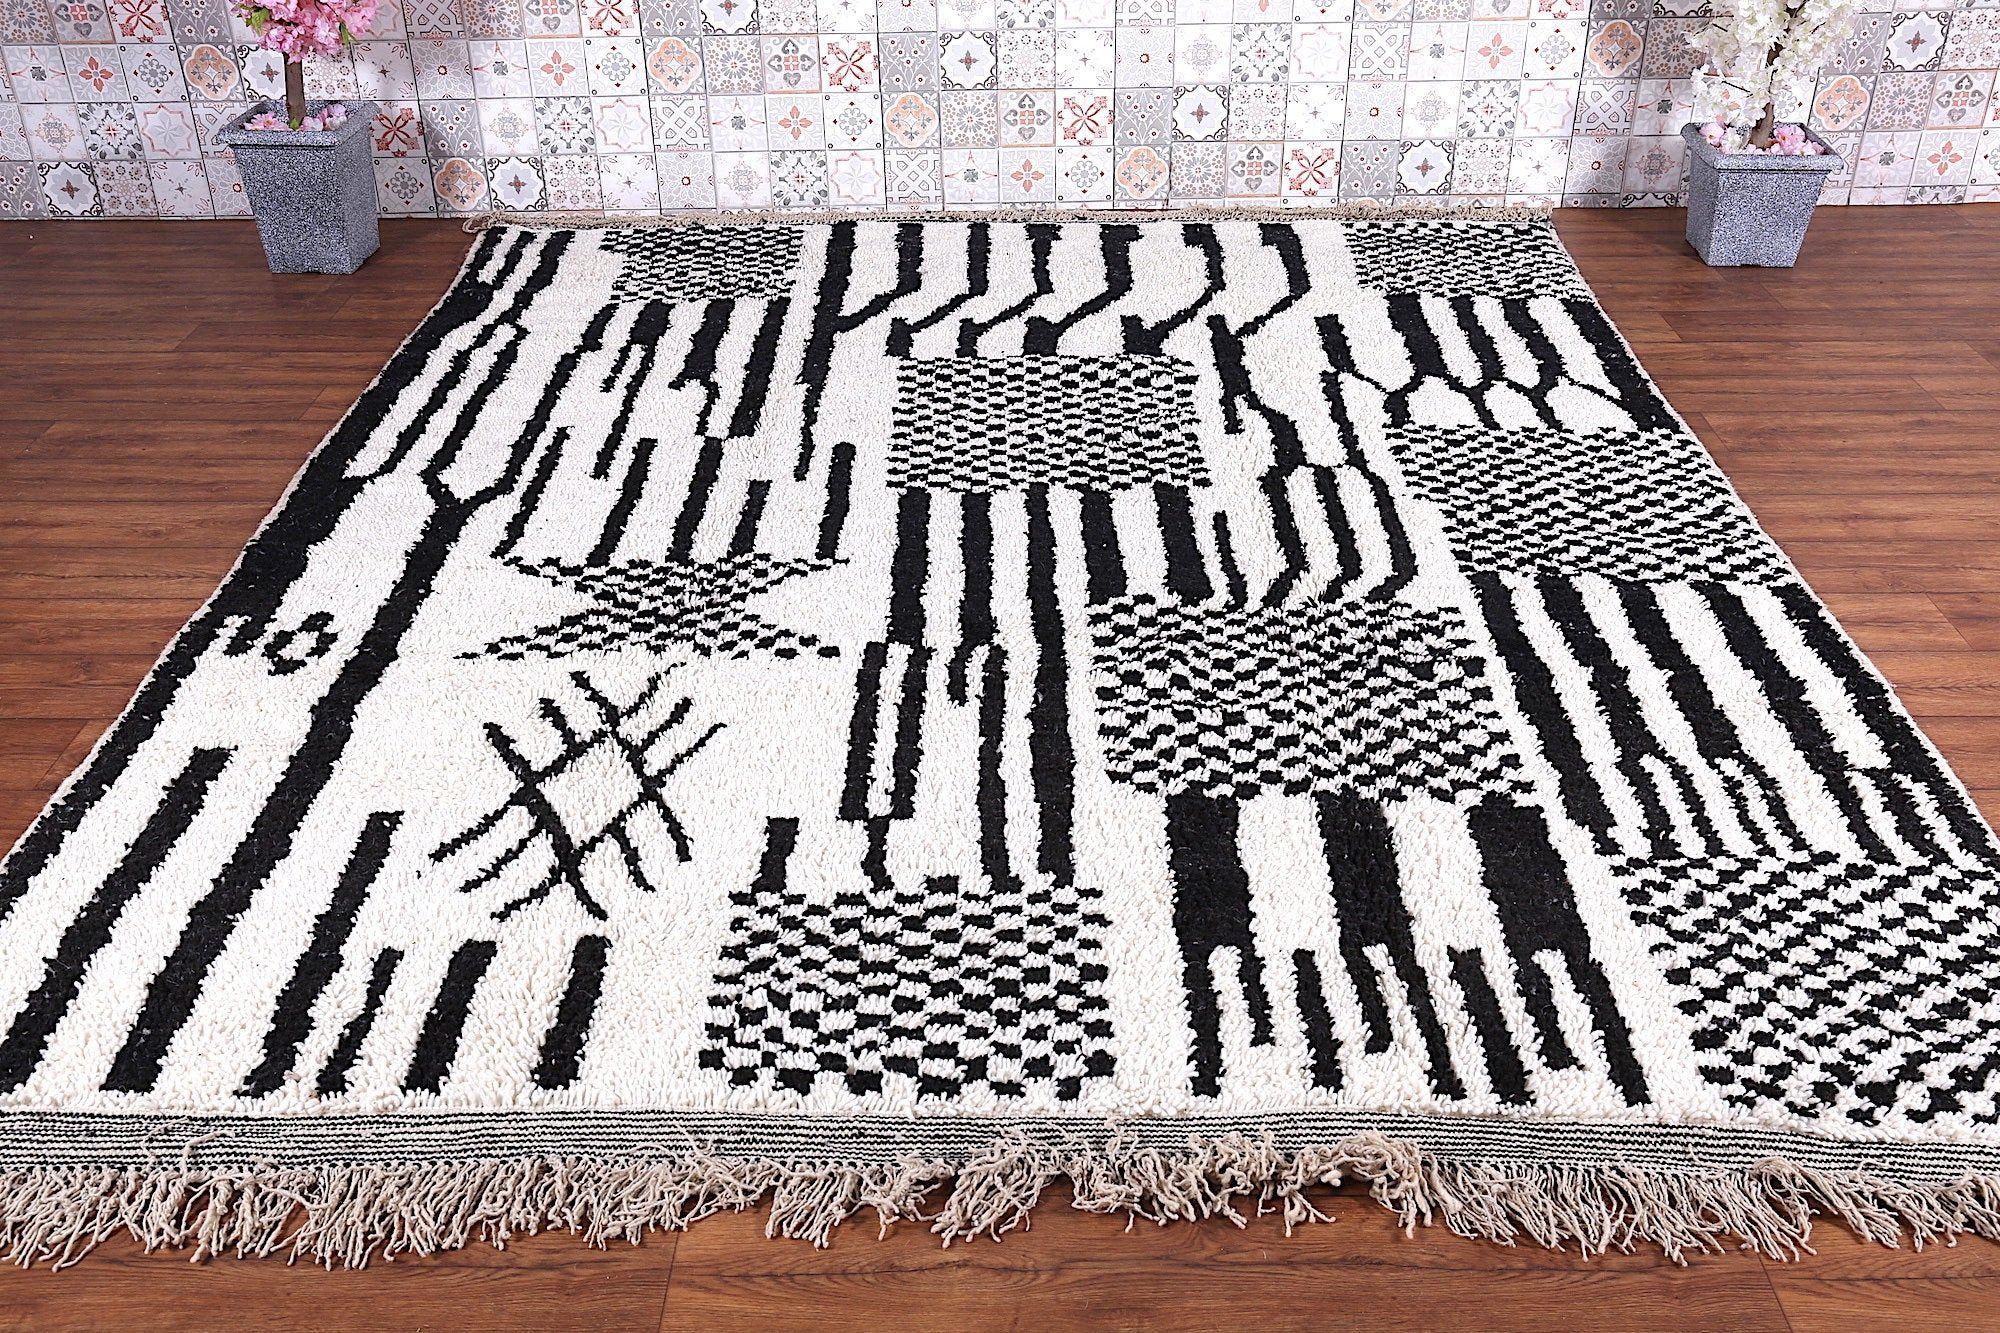 Beni Ourain Rug Black And White Rug 8x9 5 Ft Vintage Berber Rug